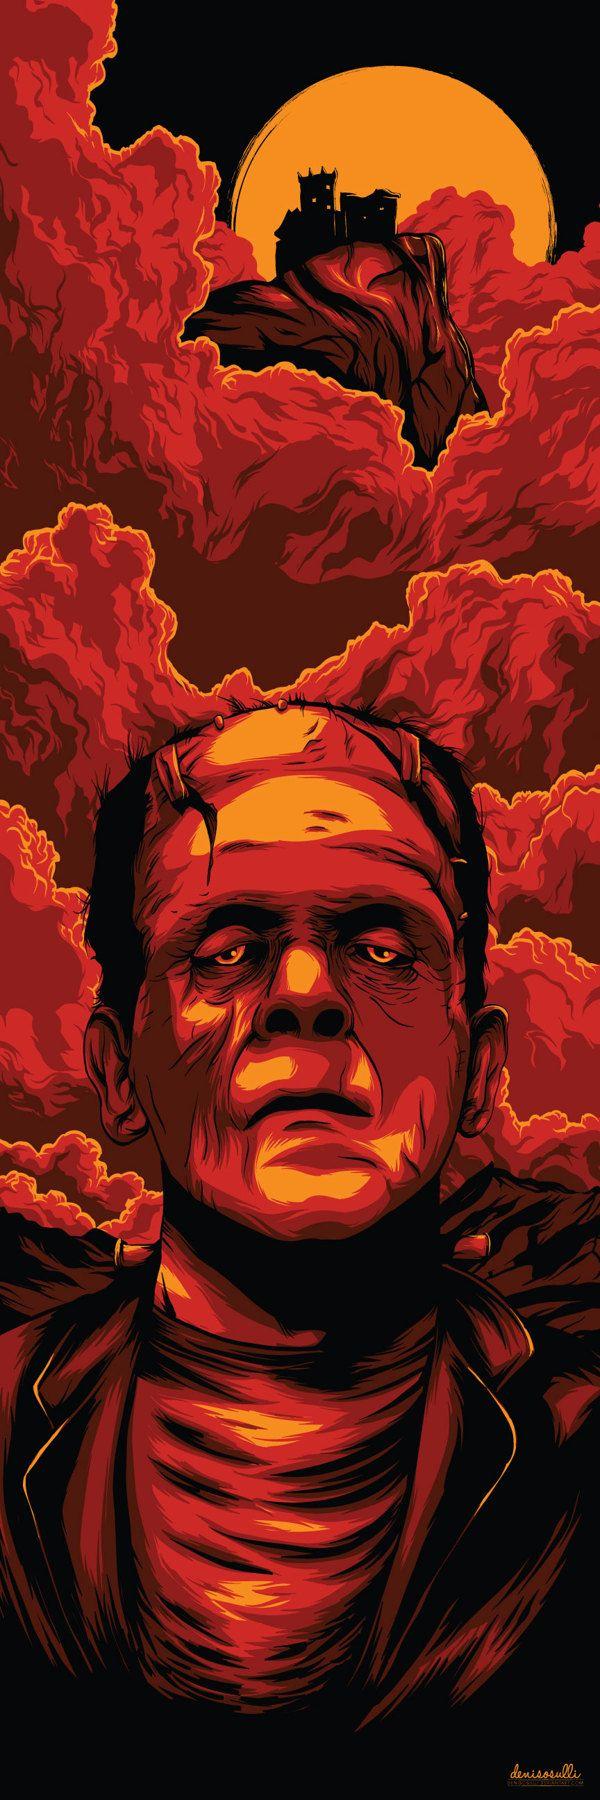 Part of weekly vector inspiration #96. Frankenstein by Denis O'Sullivan